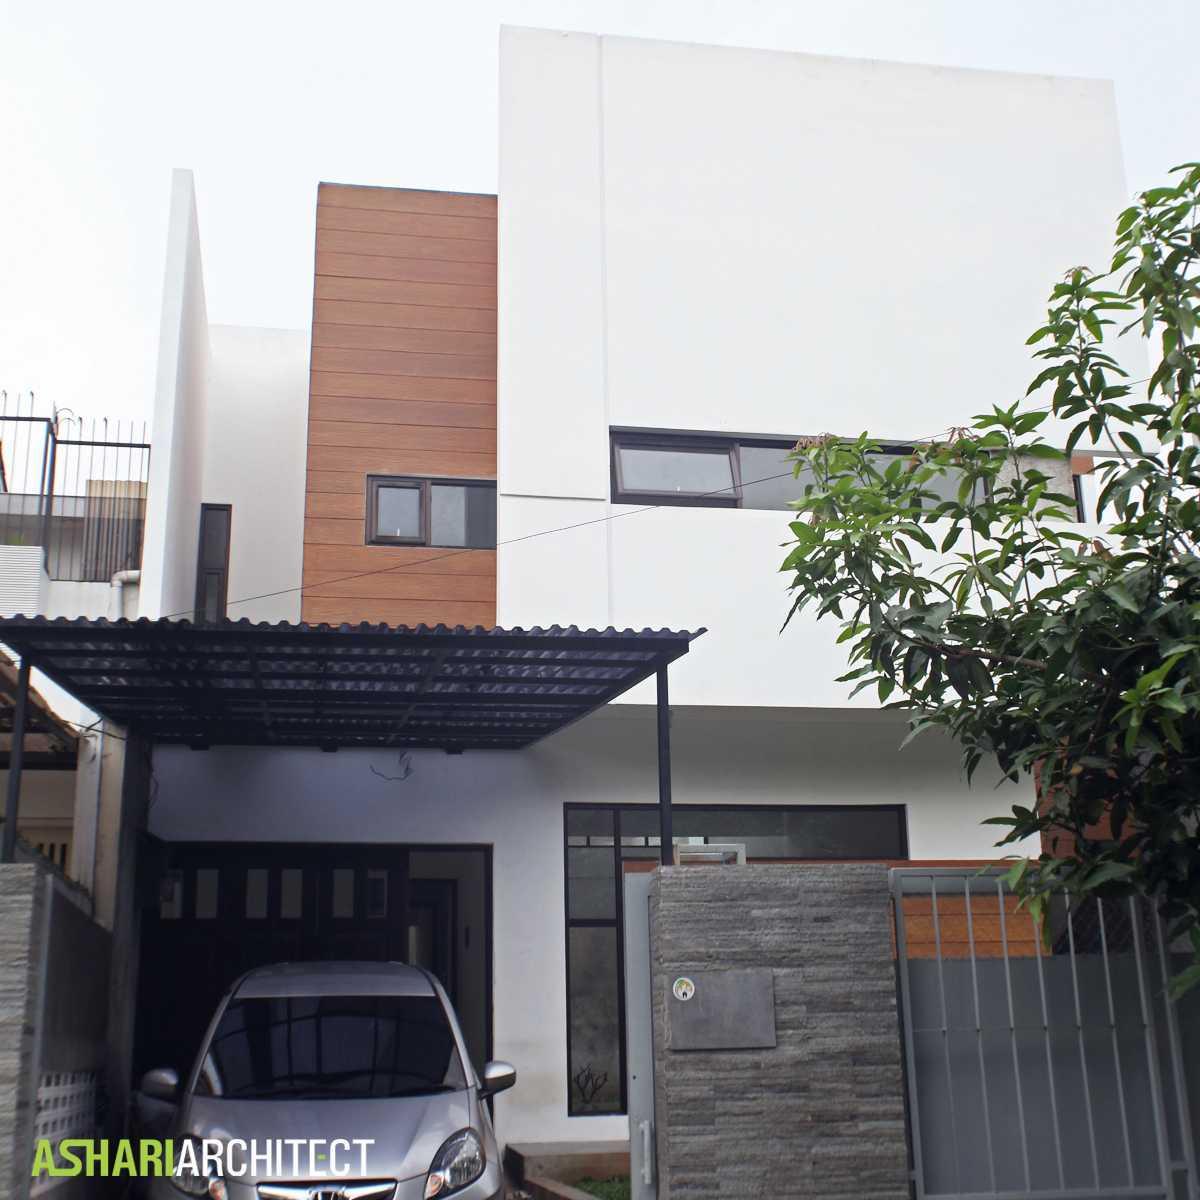 Ashari Architects Alam V House Depok, West Java, Indonesia Depok, West Java, Indonesia Front View Kontemporer 11859